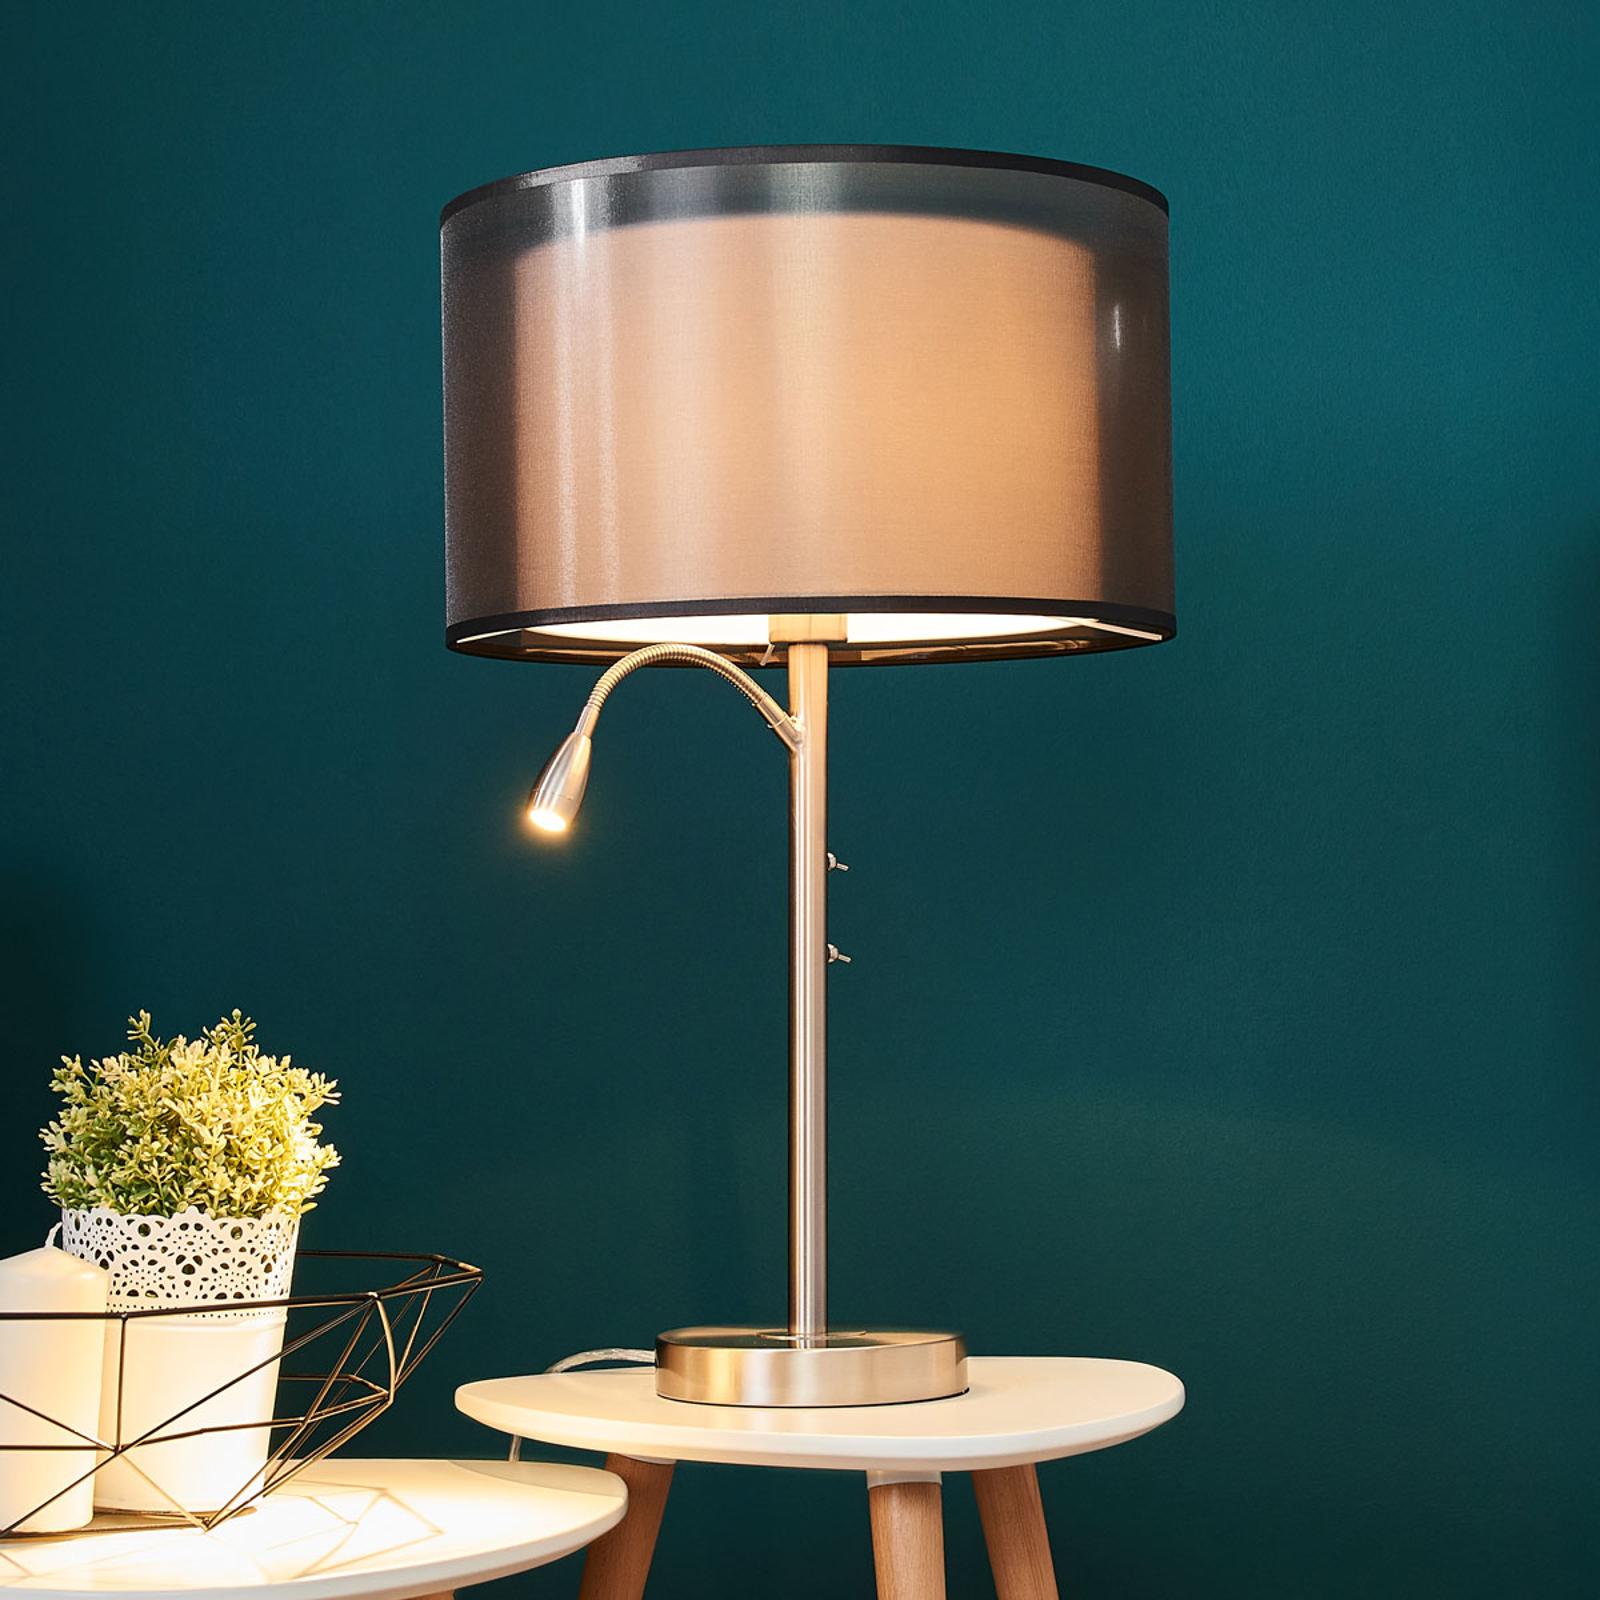 Lampe à poser Damento translucide aspect double